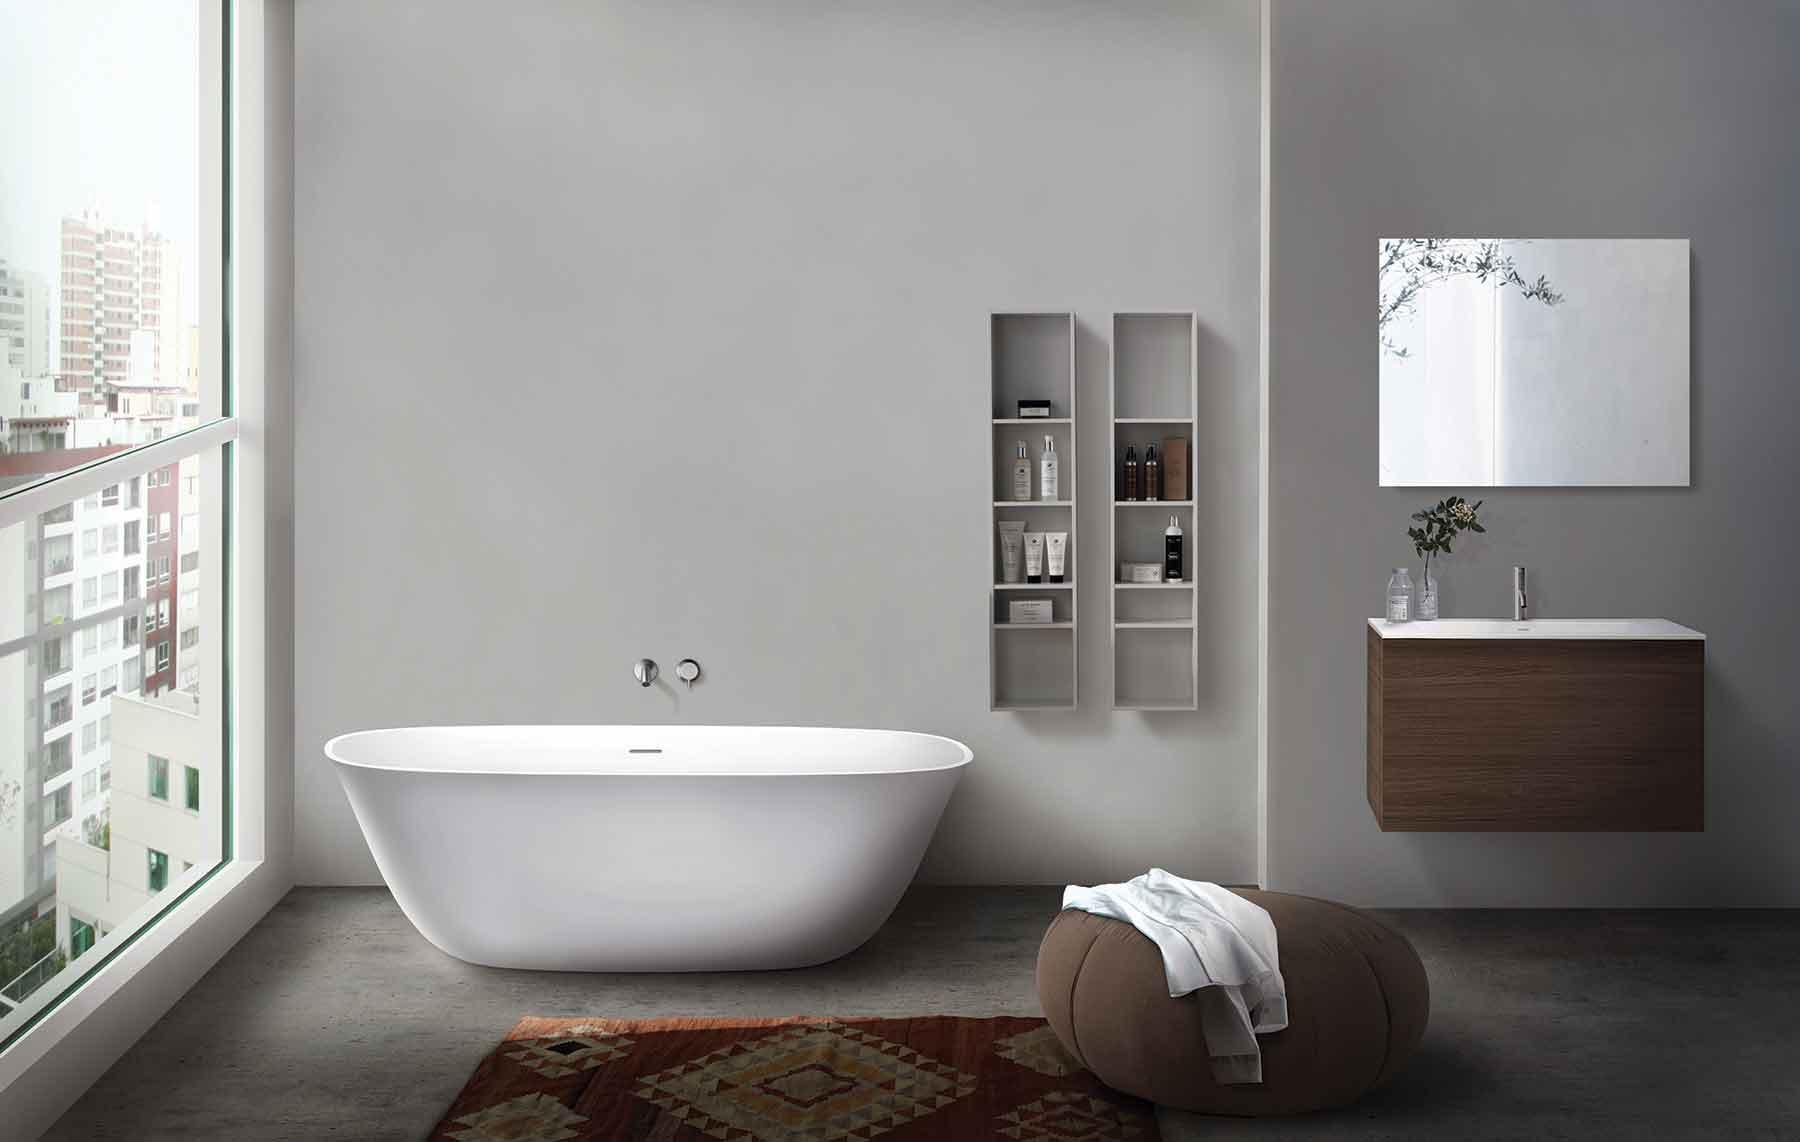 Modern Luna Freestanding Oval Bathtub